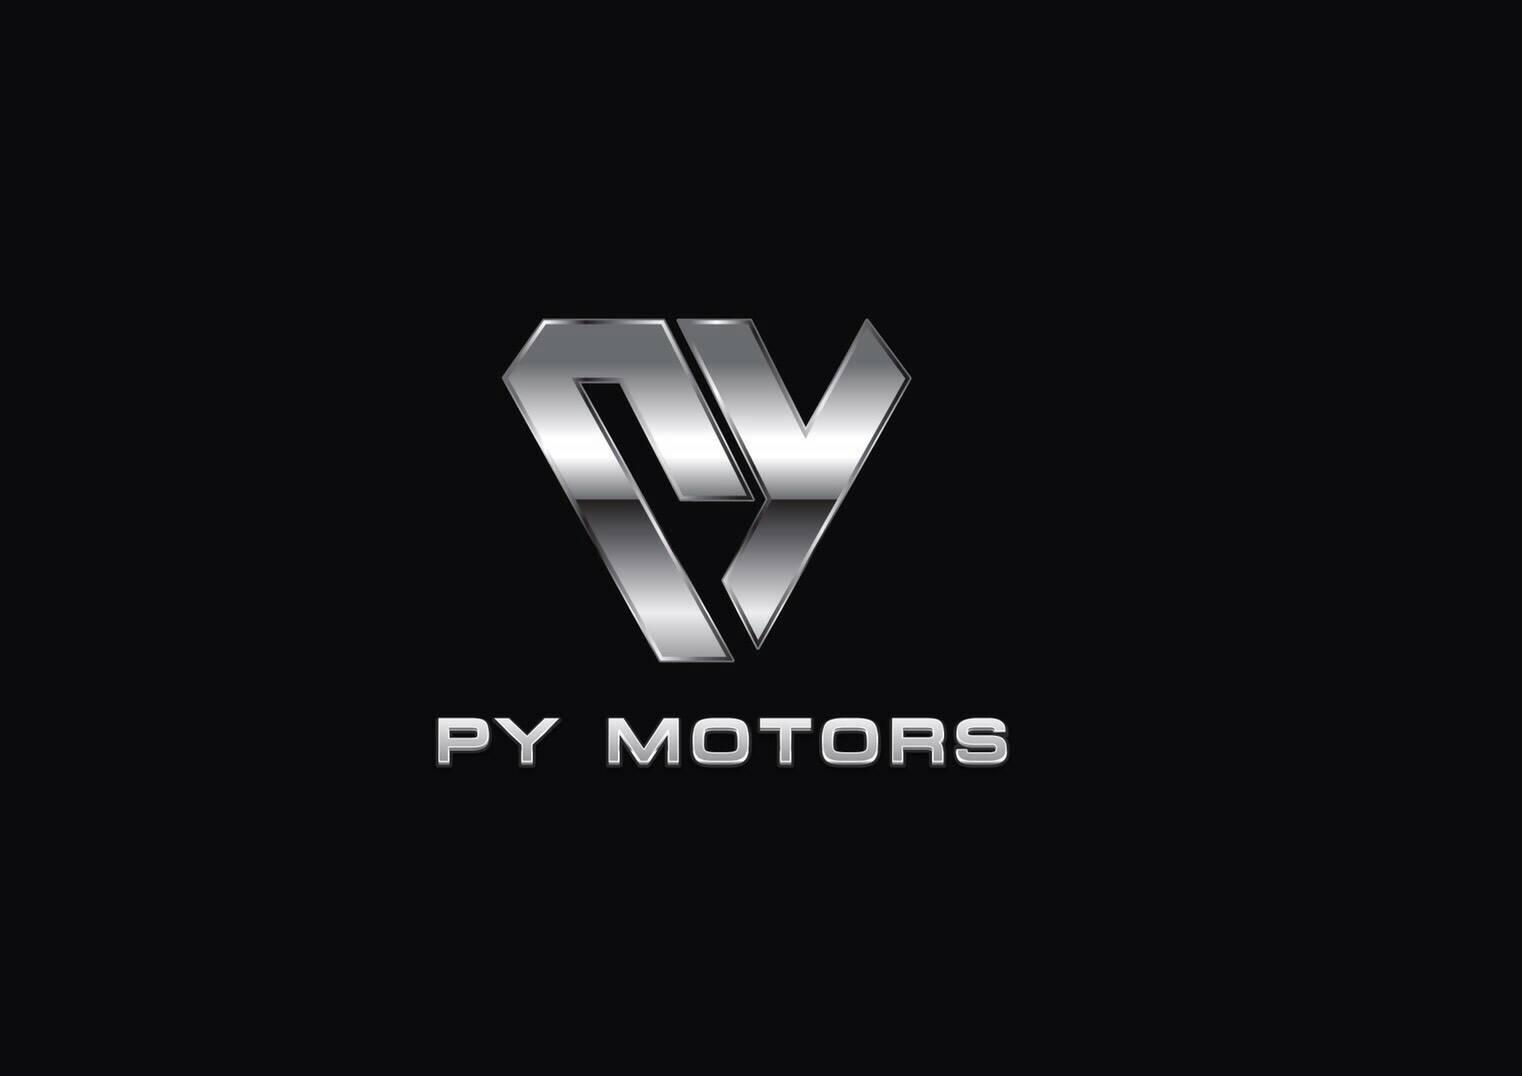 PY MOTORS